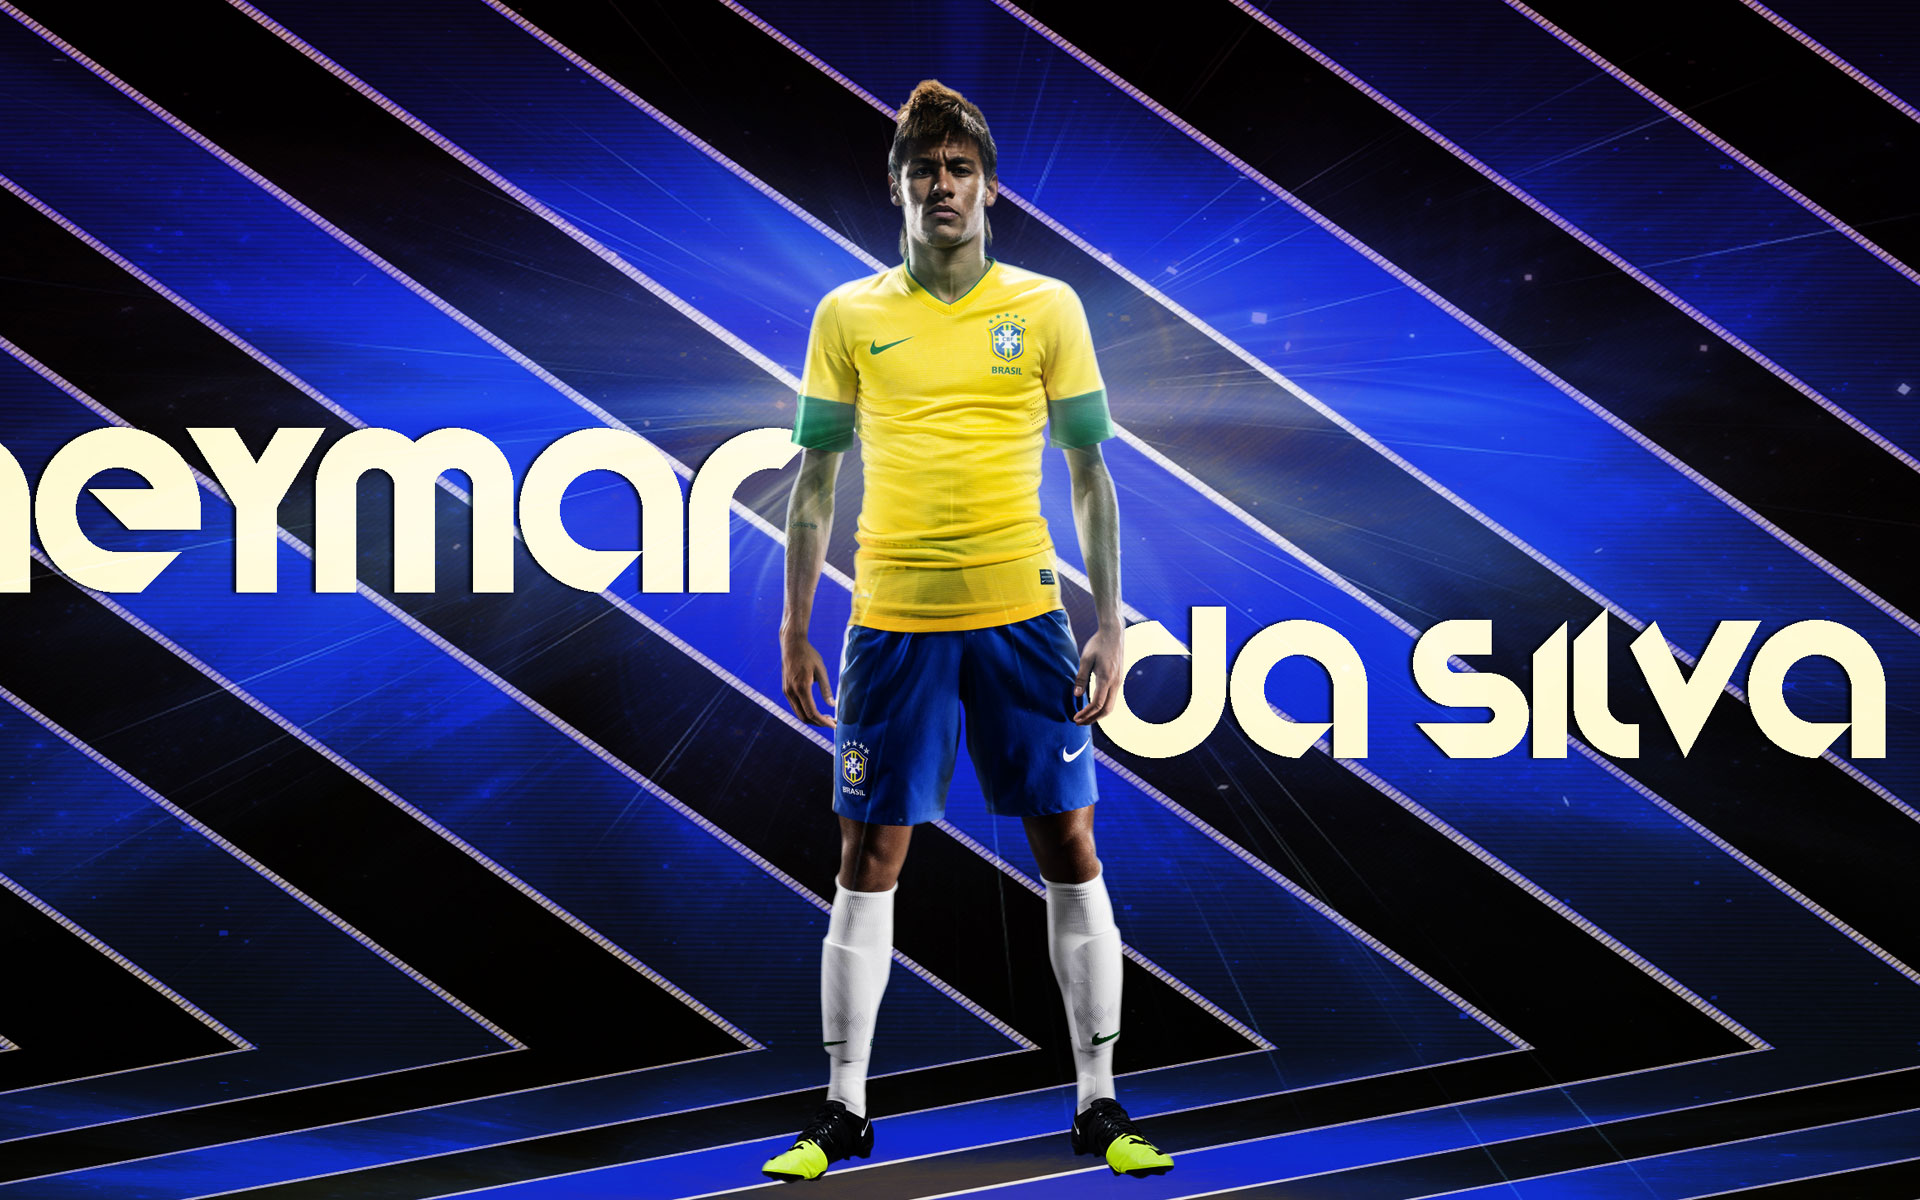 Wallpaper Hd 1080p Free Download For Mobile Cool Neymar Wallpapers Hd Pixelstalk Net